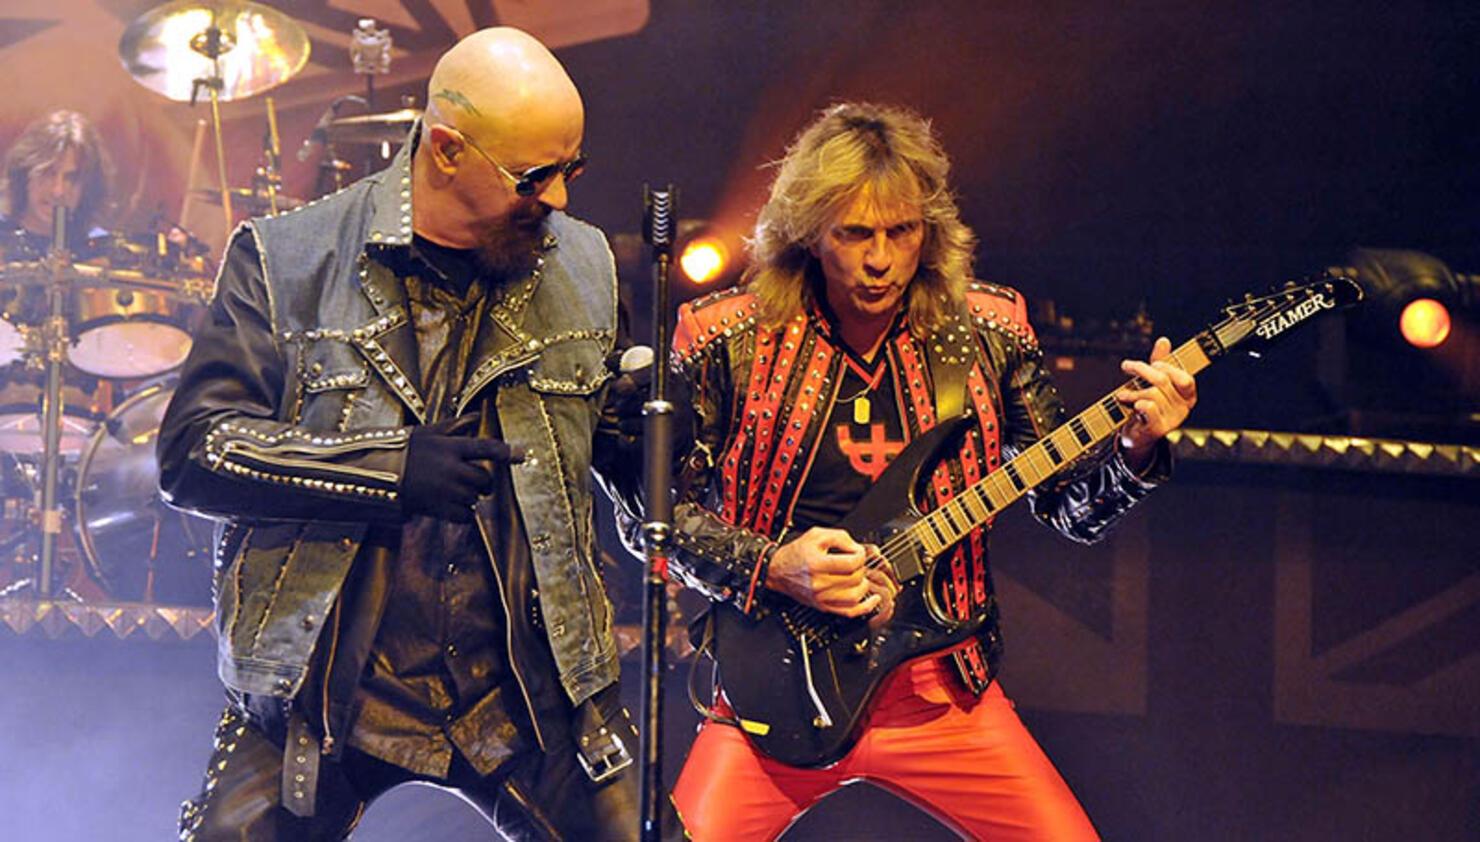 Judas Priest Launch Glenn Tipton's Parkinson's Foundation